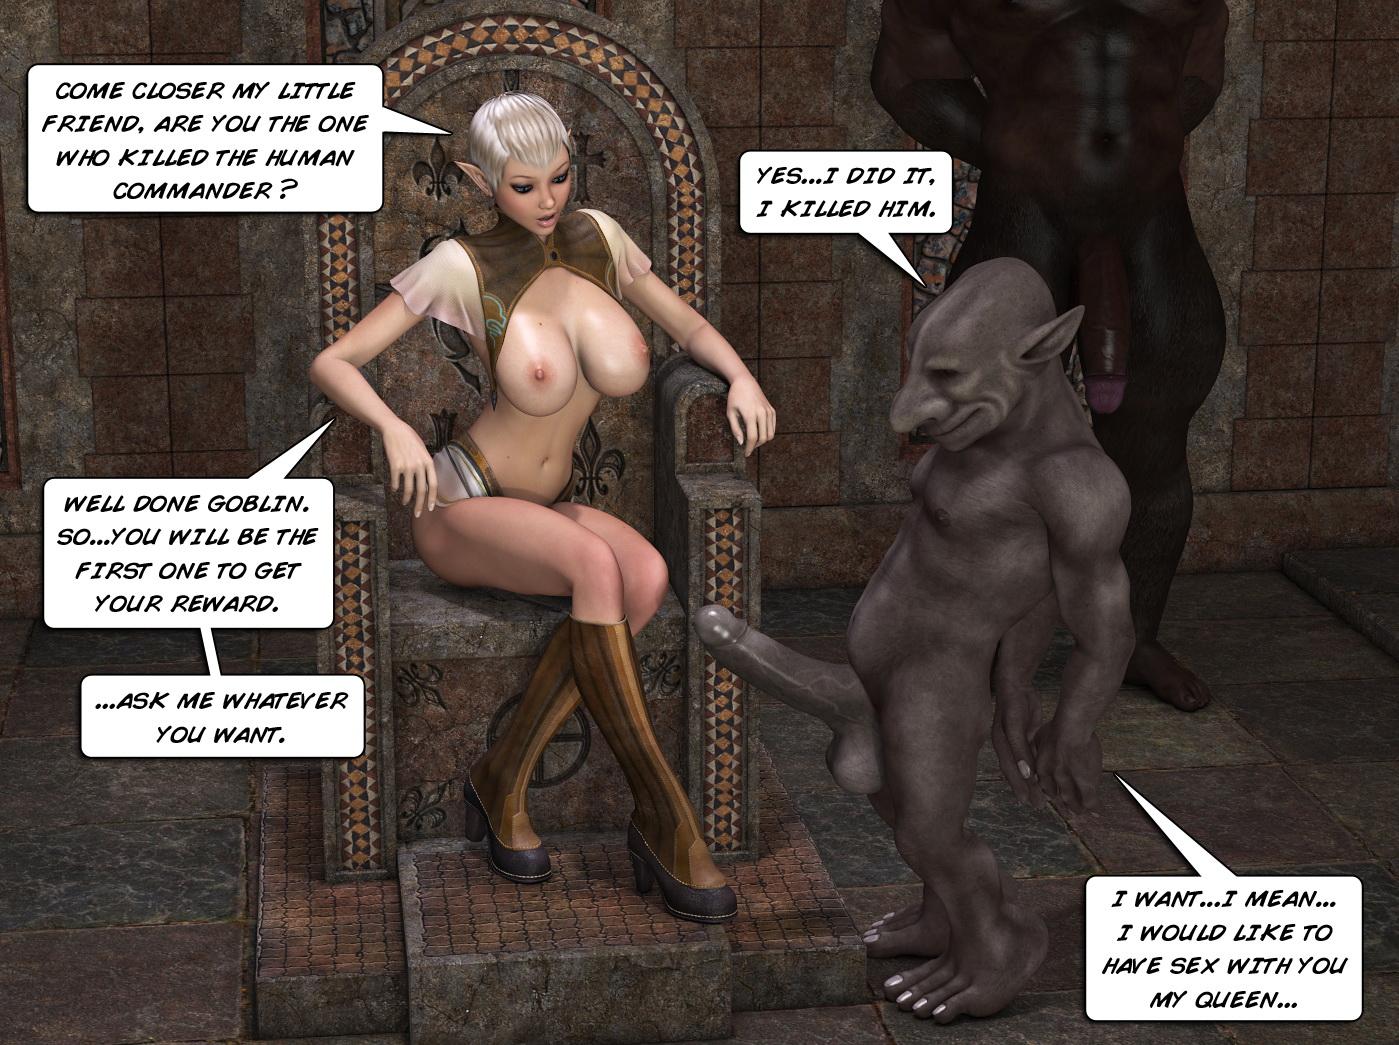 smotret-porno-goblina